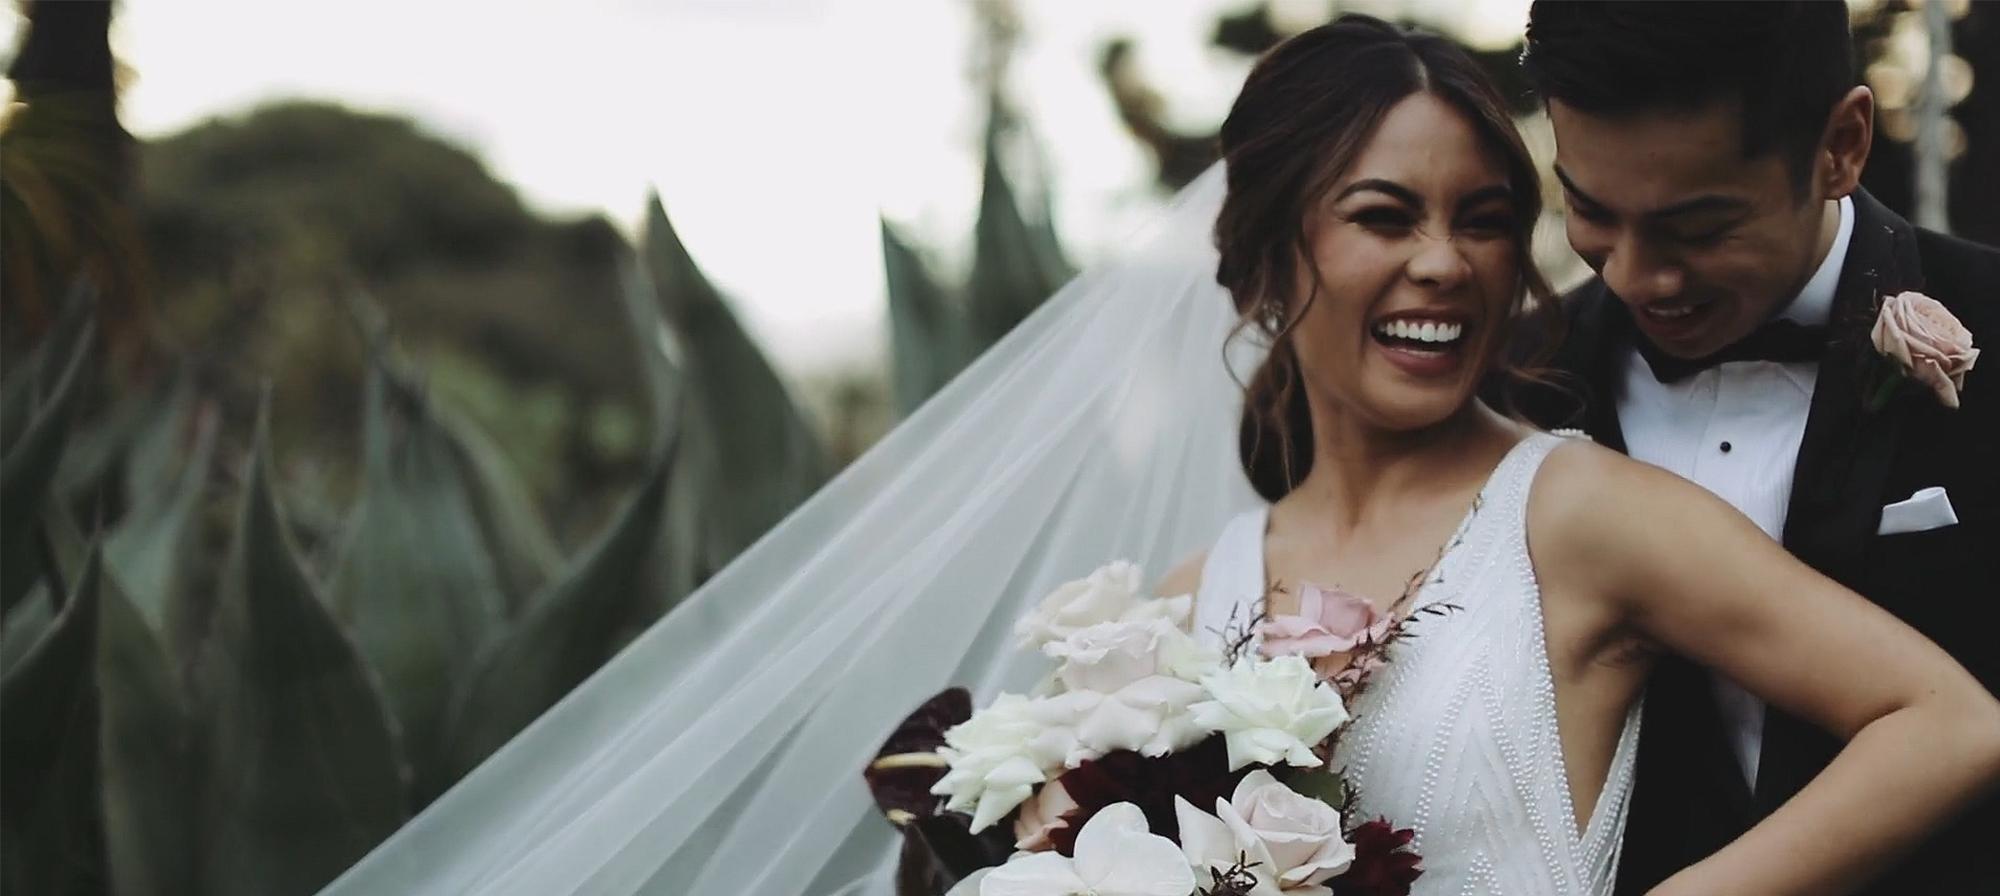 Annette-and-Dani-Films-Kat and Mark2-wedding-video.jpg